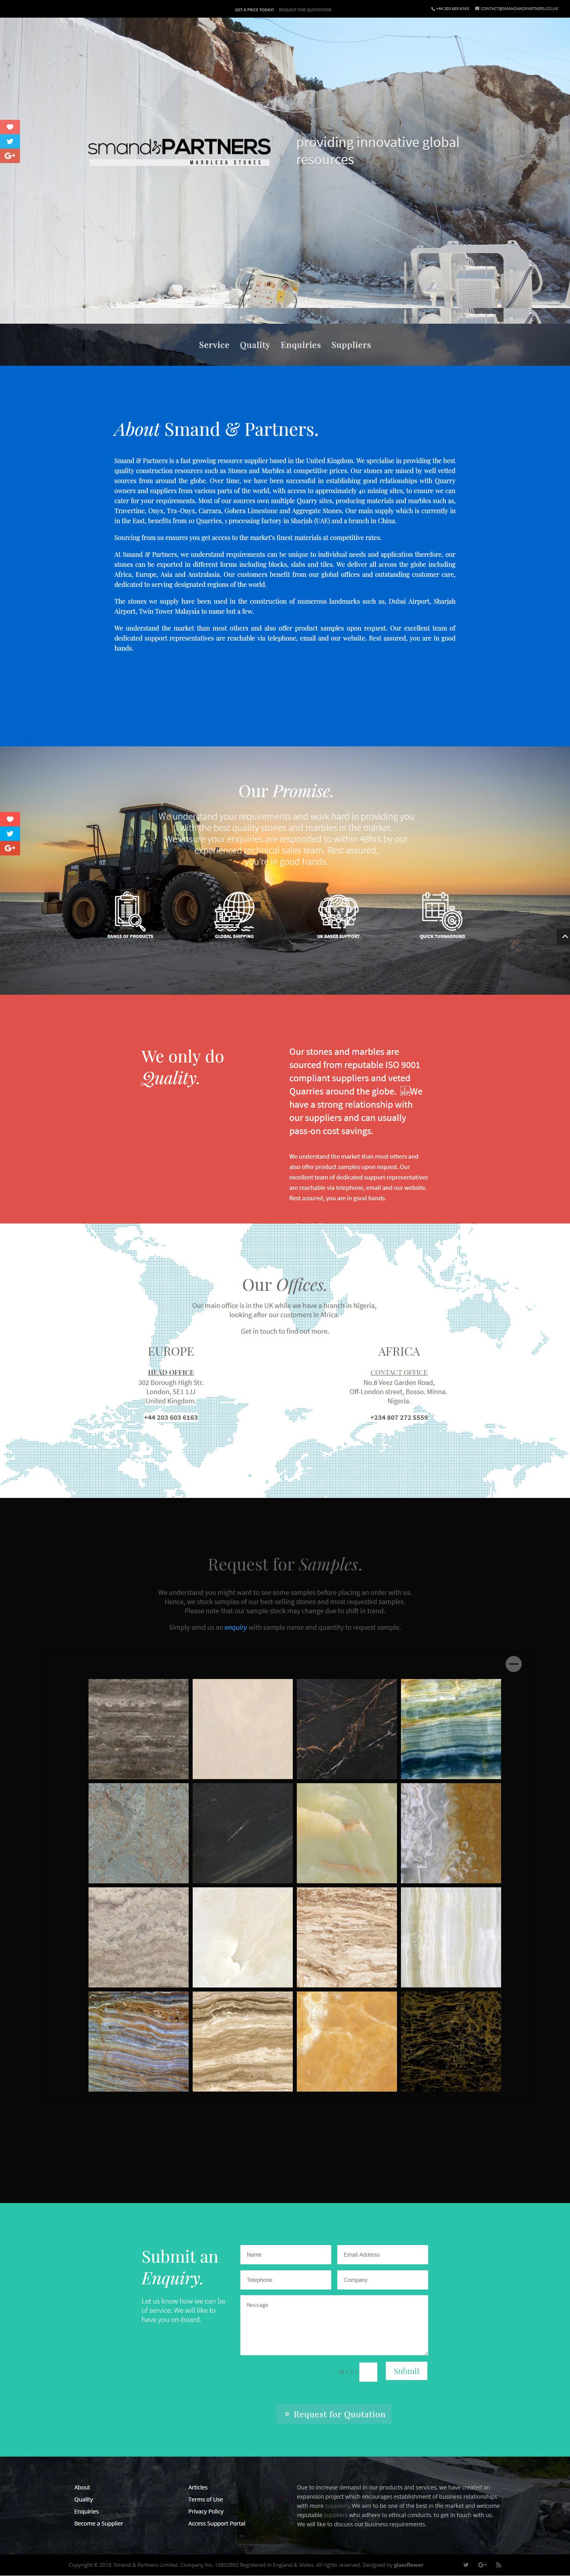 Smand-&-Partners-Website